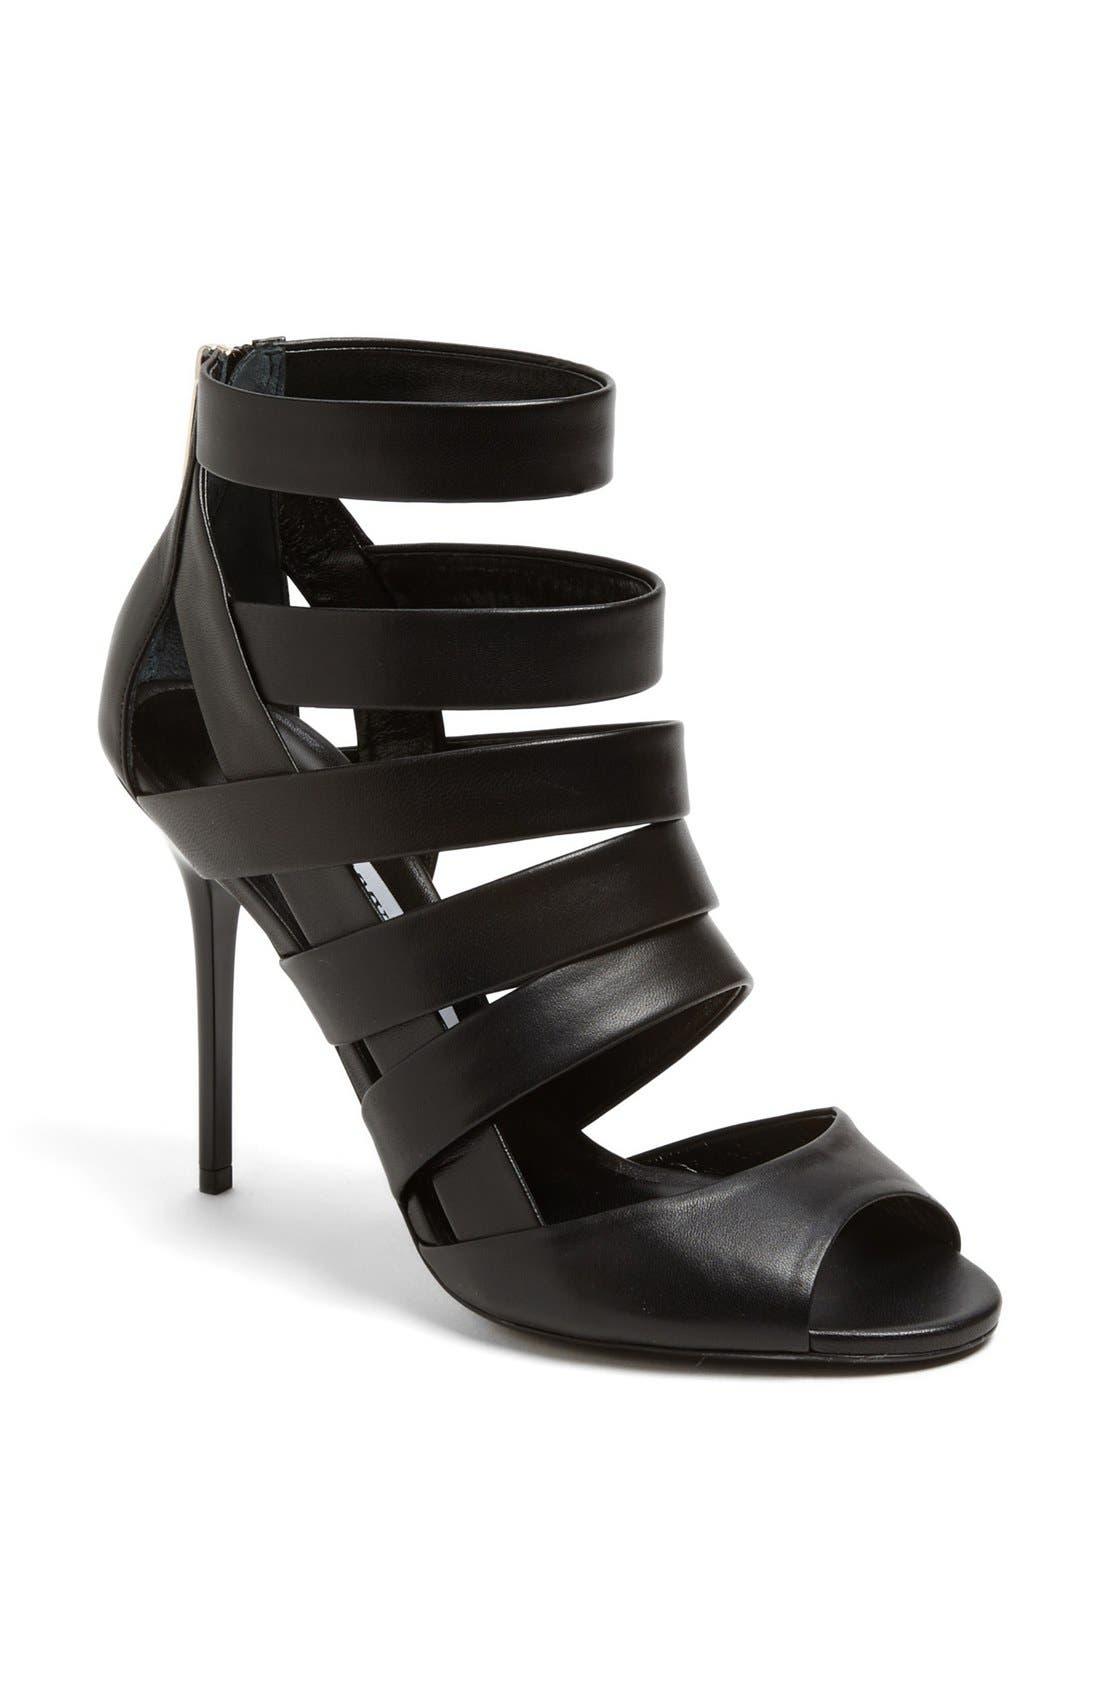 Alternate Image 1 Selected - Jimmy Choo 'Dame' Sandal